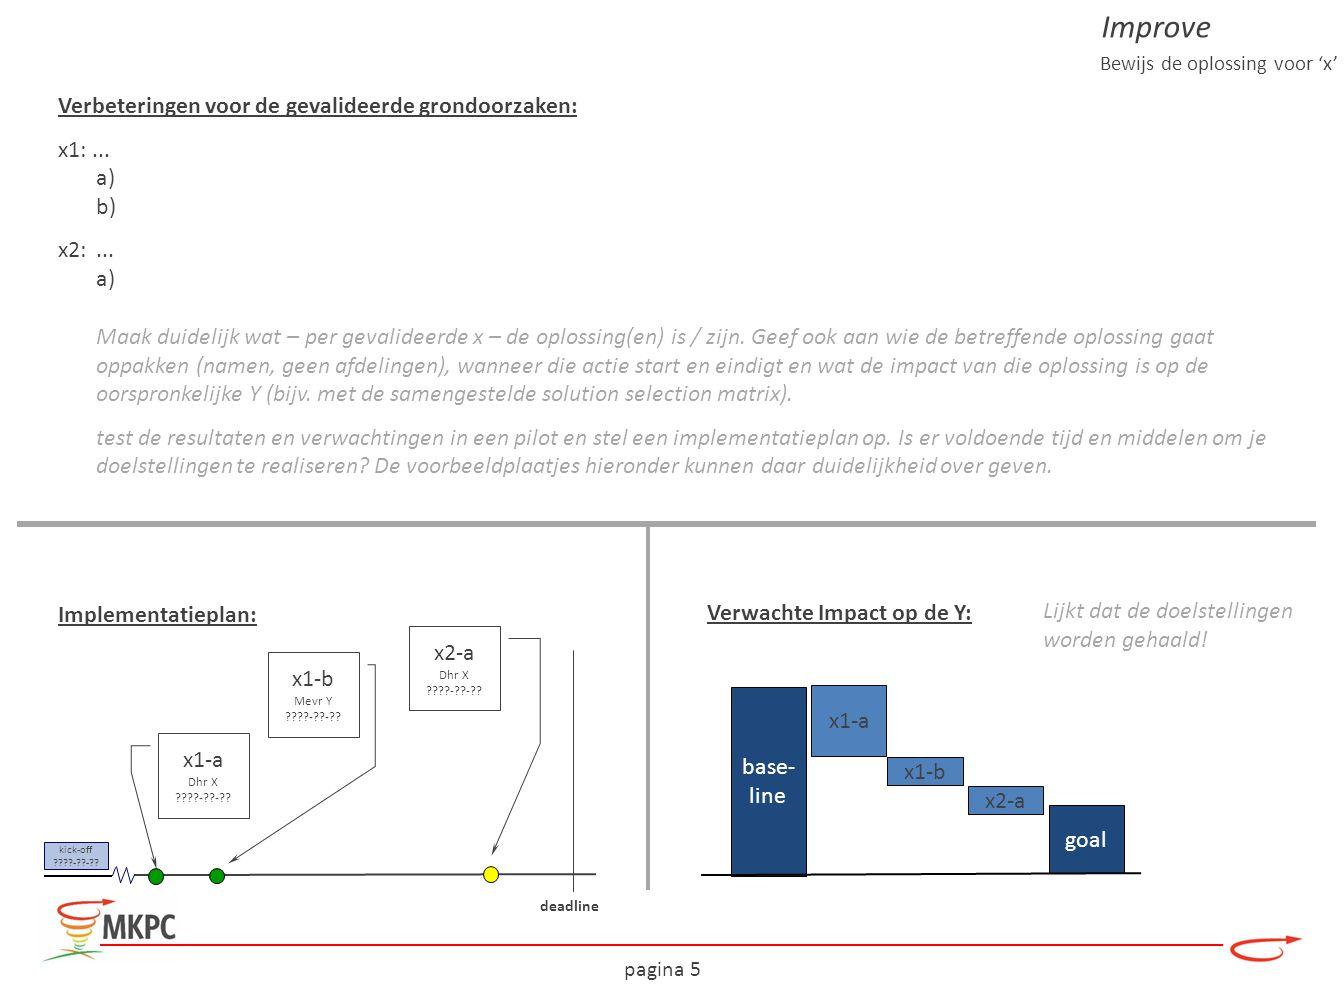 pagina 6 Control plan: x1:...a)... b)... x2:... a)...